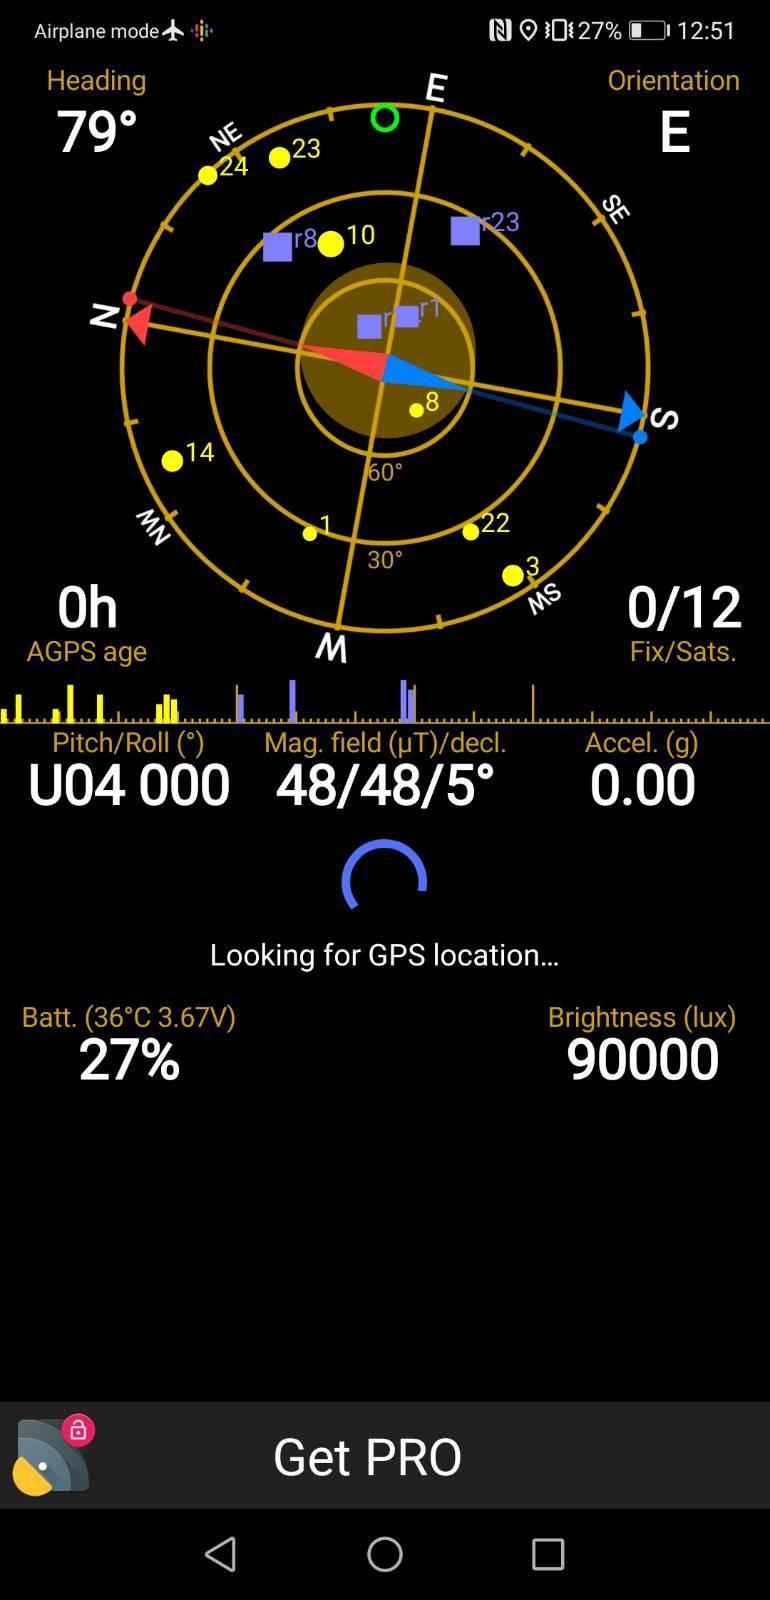 signal-2021-08-10-125702_001.jpeg